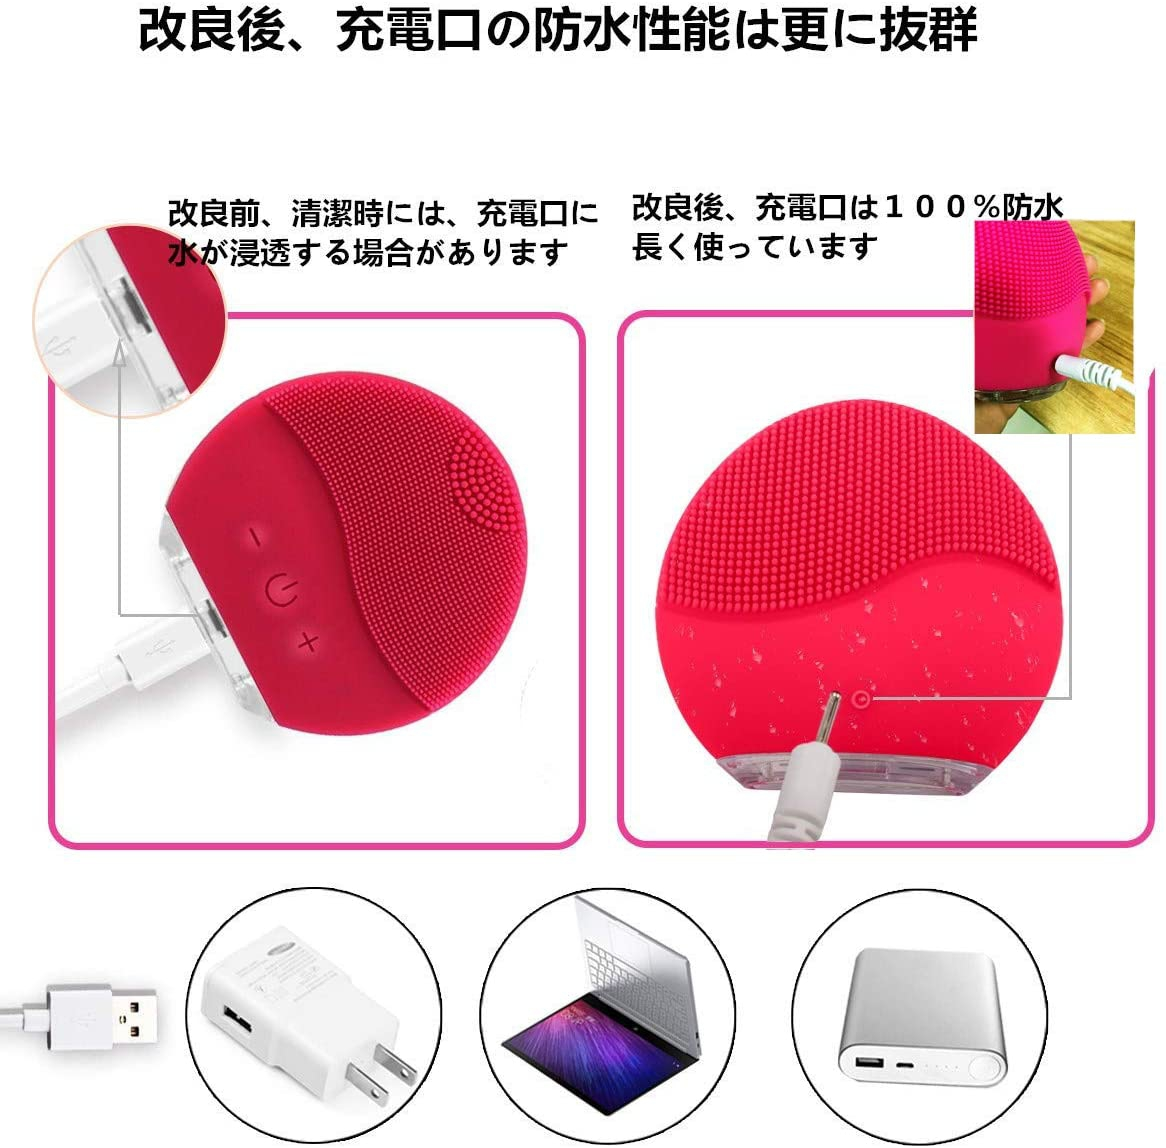 HANAMO(ハナモ) 電動 洗顔ブラシの商品画像2